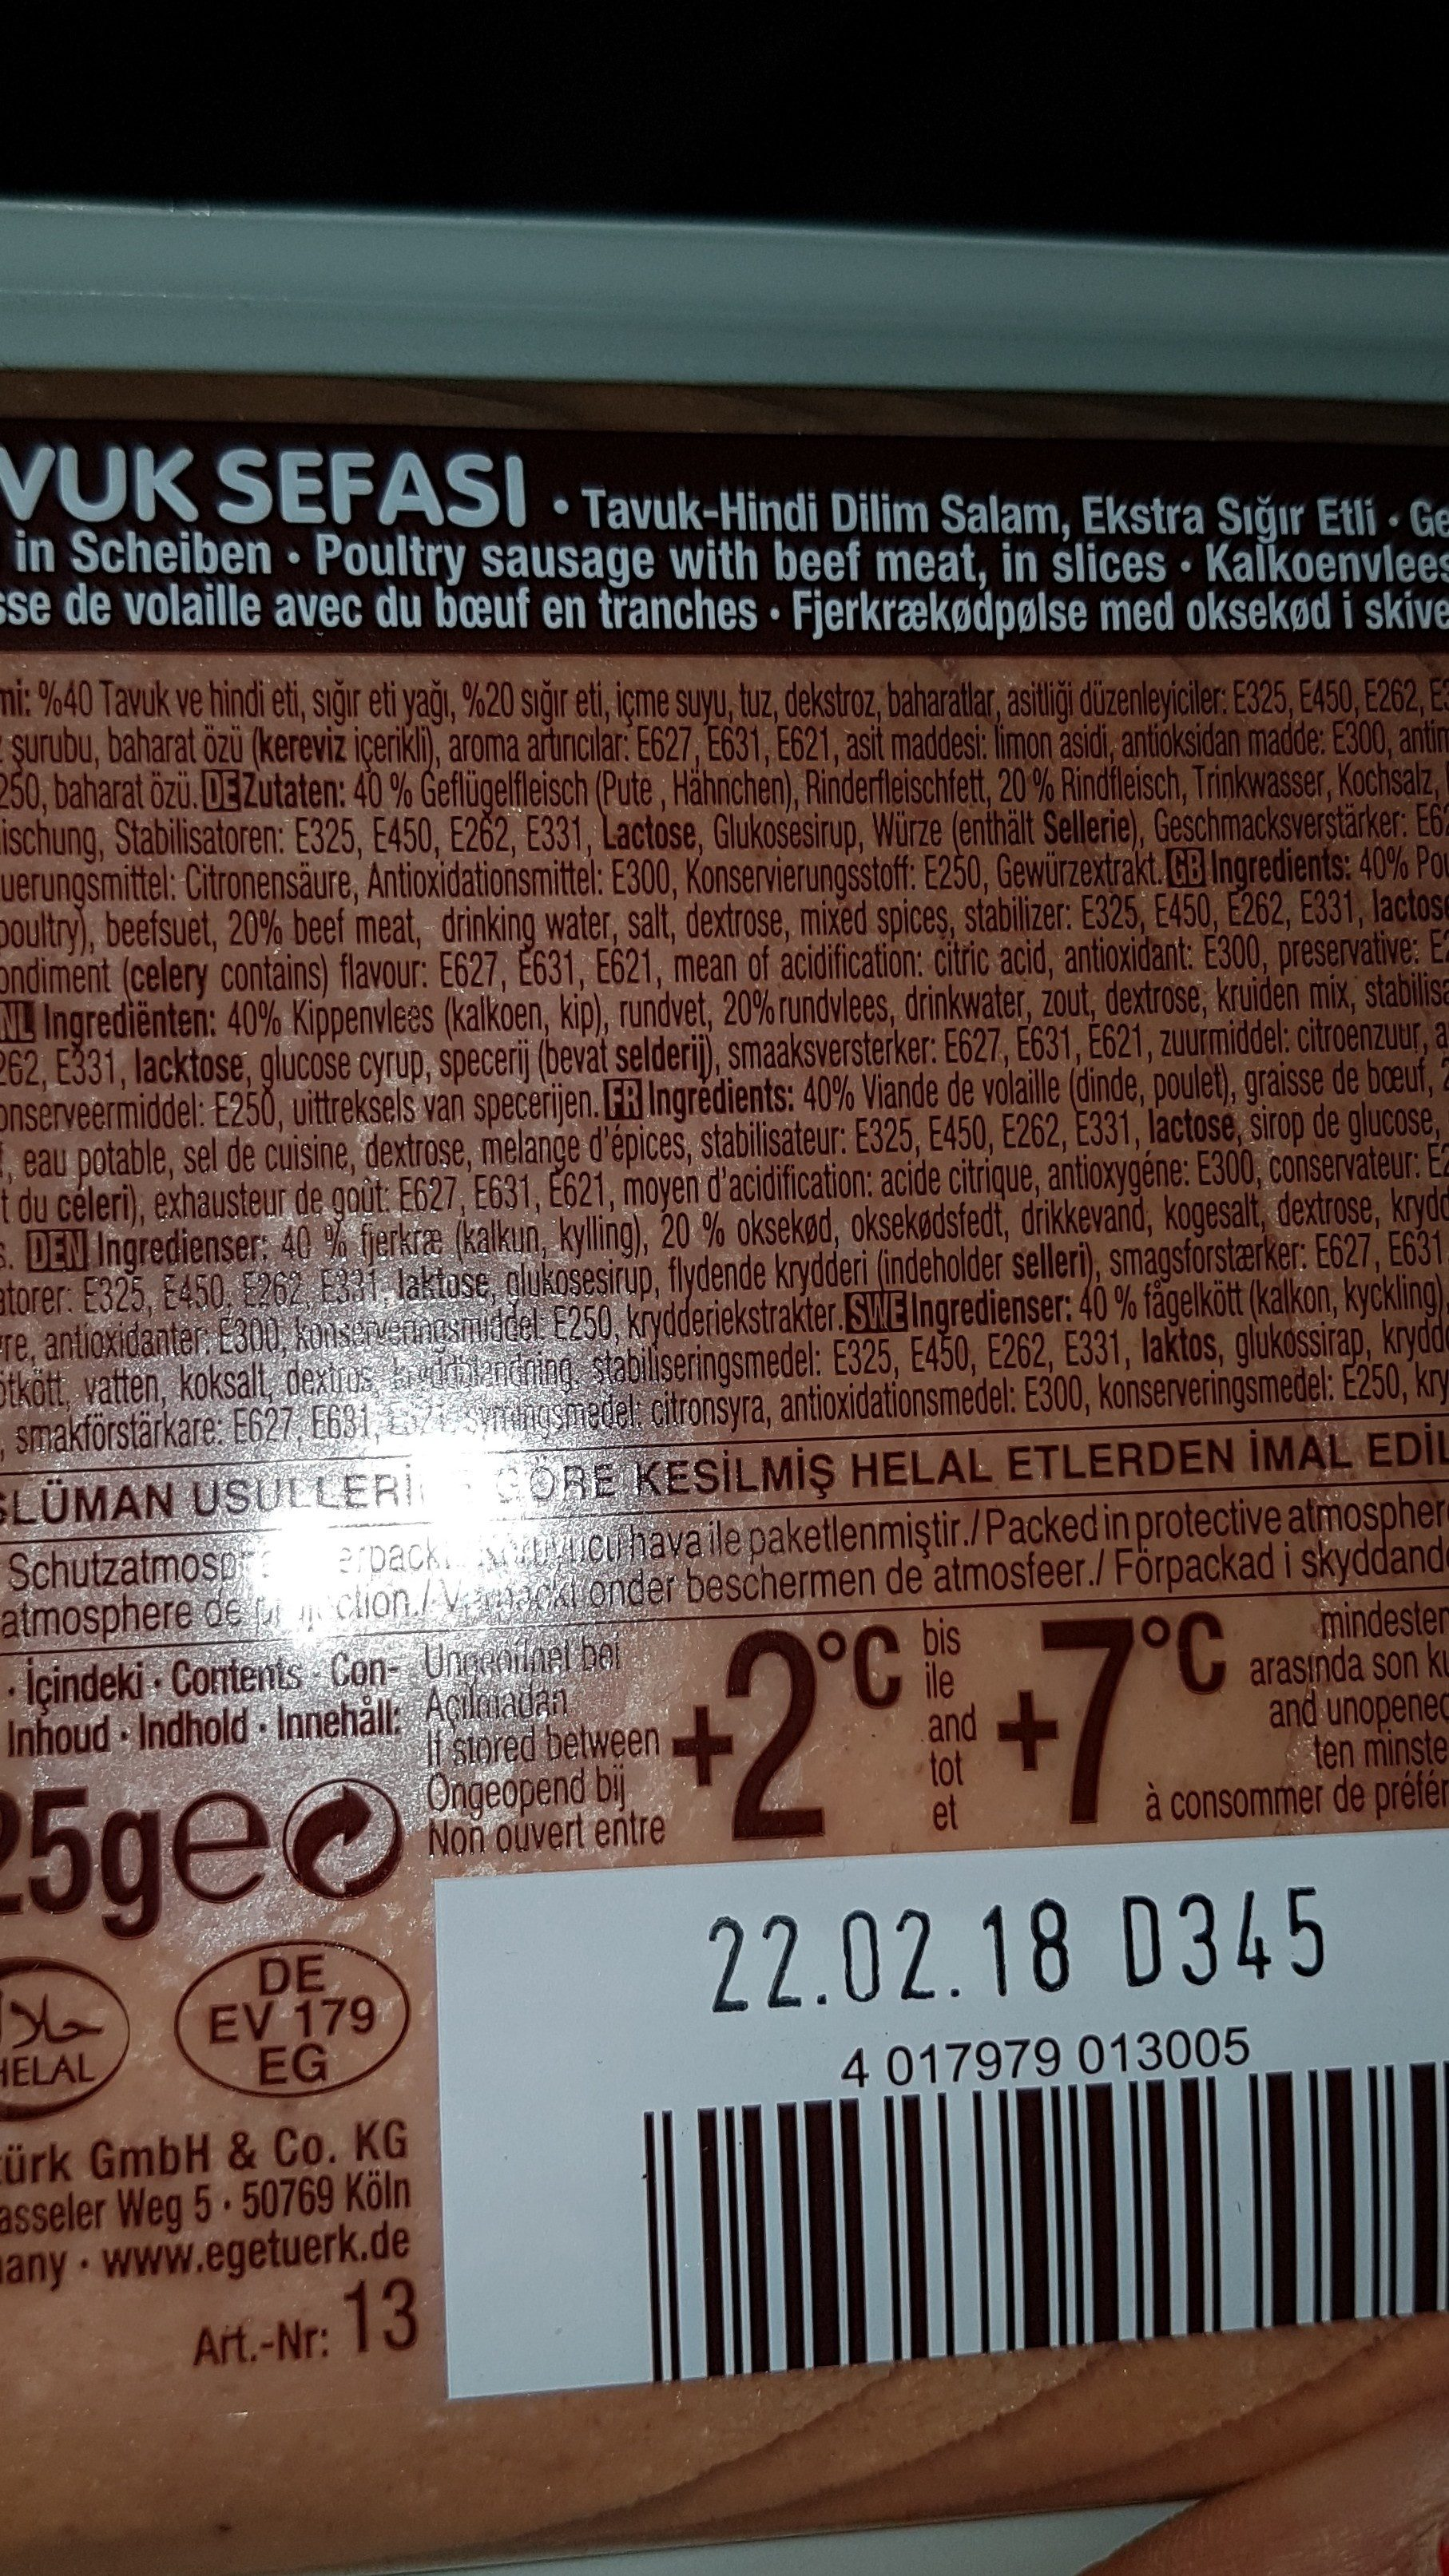 Egeturk Kipsalami - Ingredients - fr